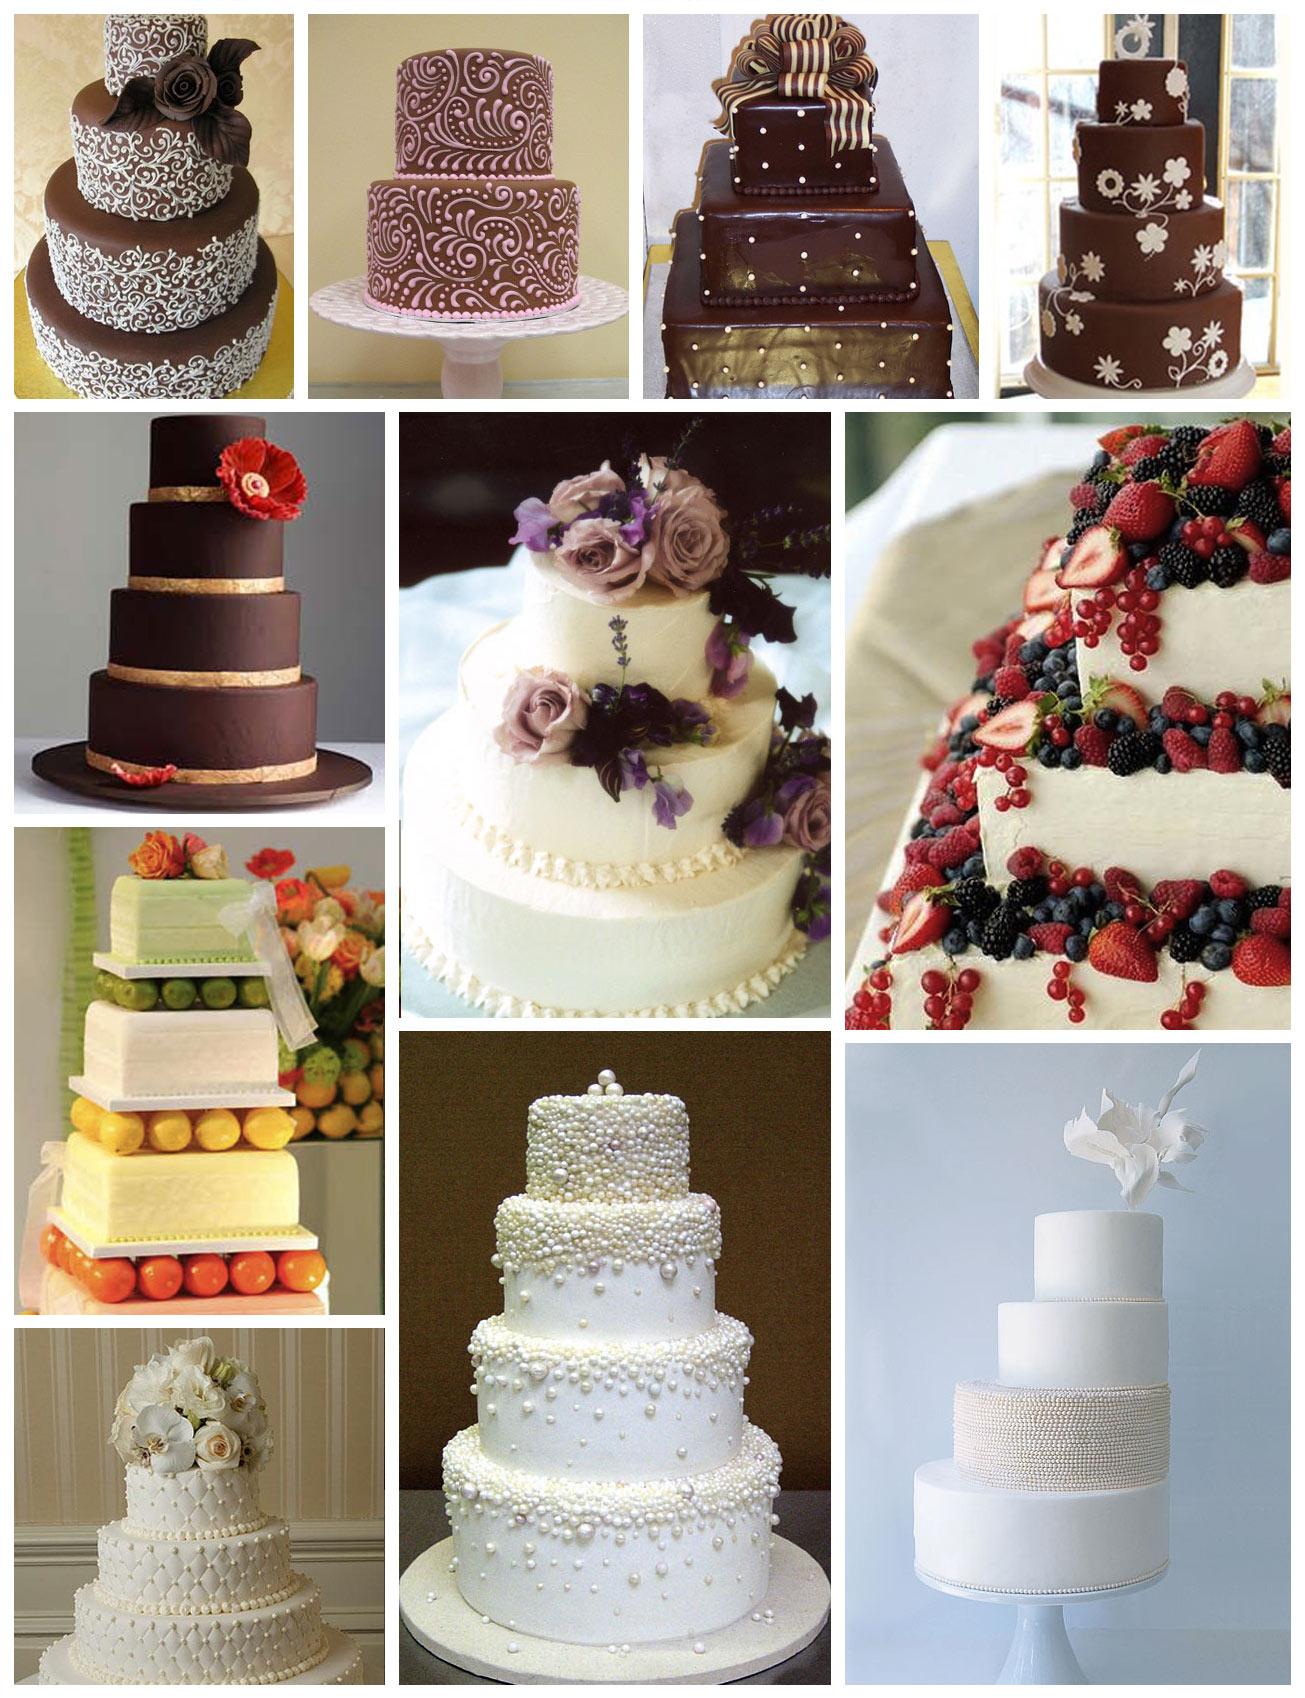 Torta de Casamiento Moderna | Fotos | Ideas Torta de Casamiento